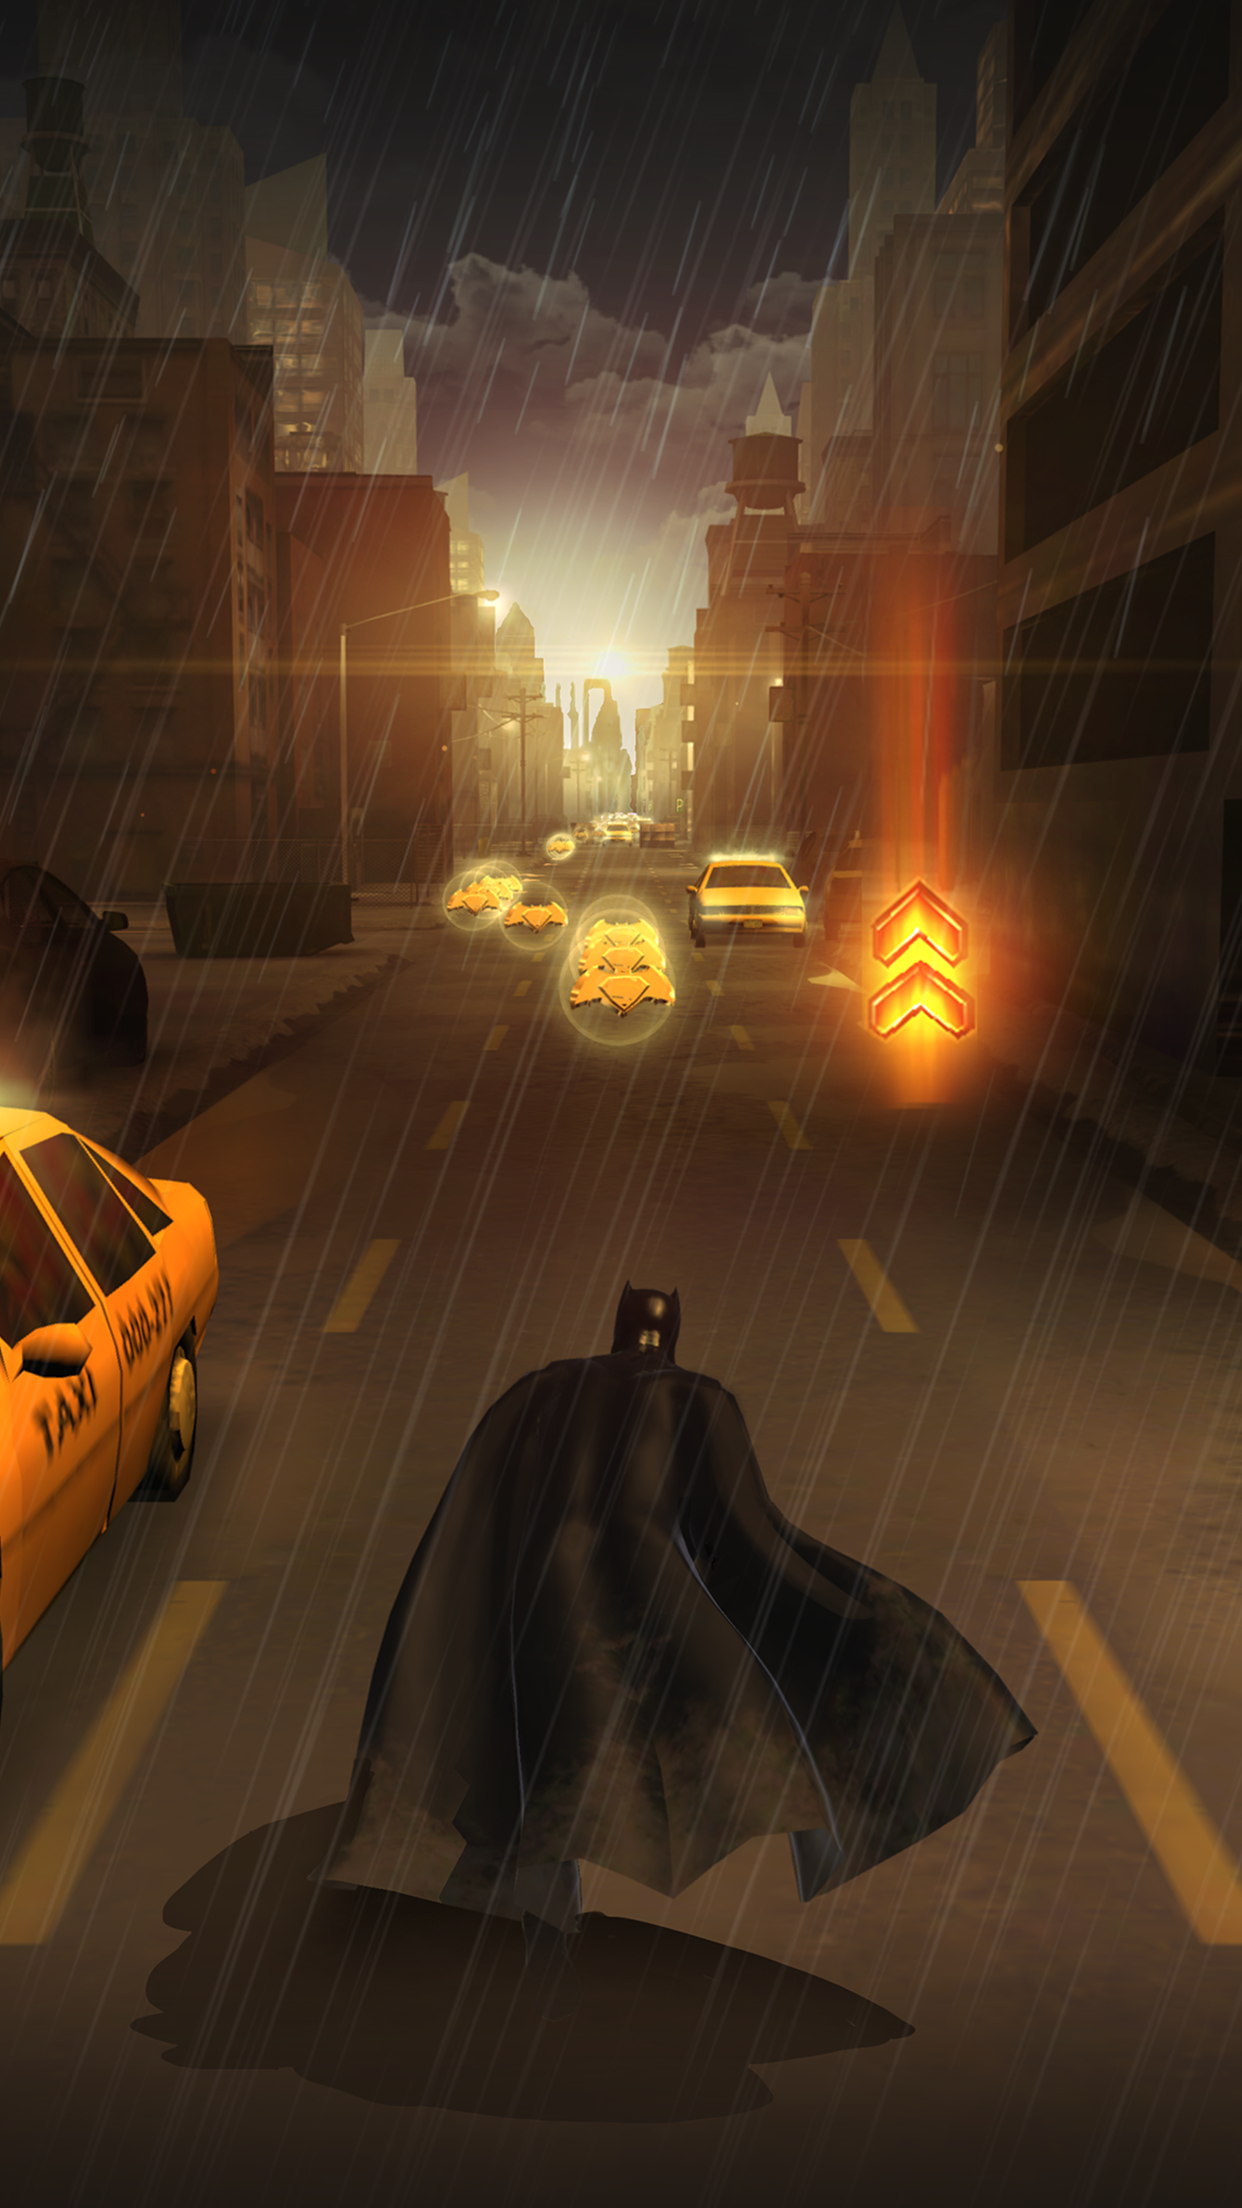 Batman v Superman Who Will Win screenshot #1